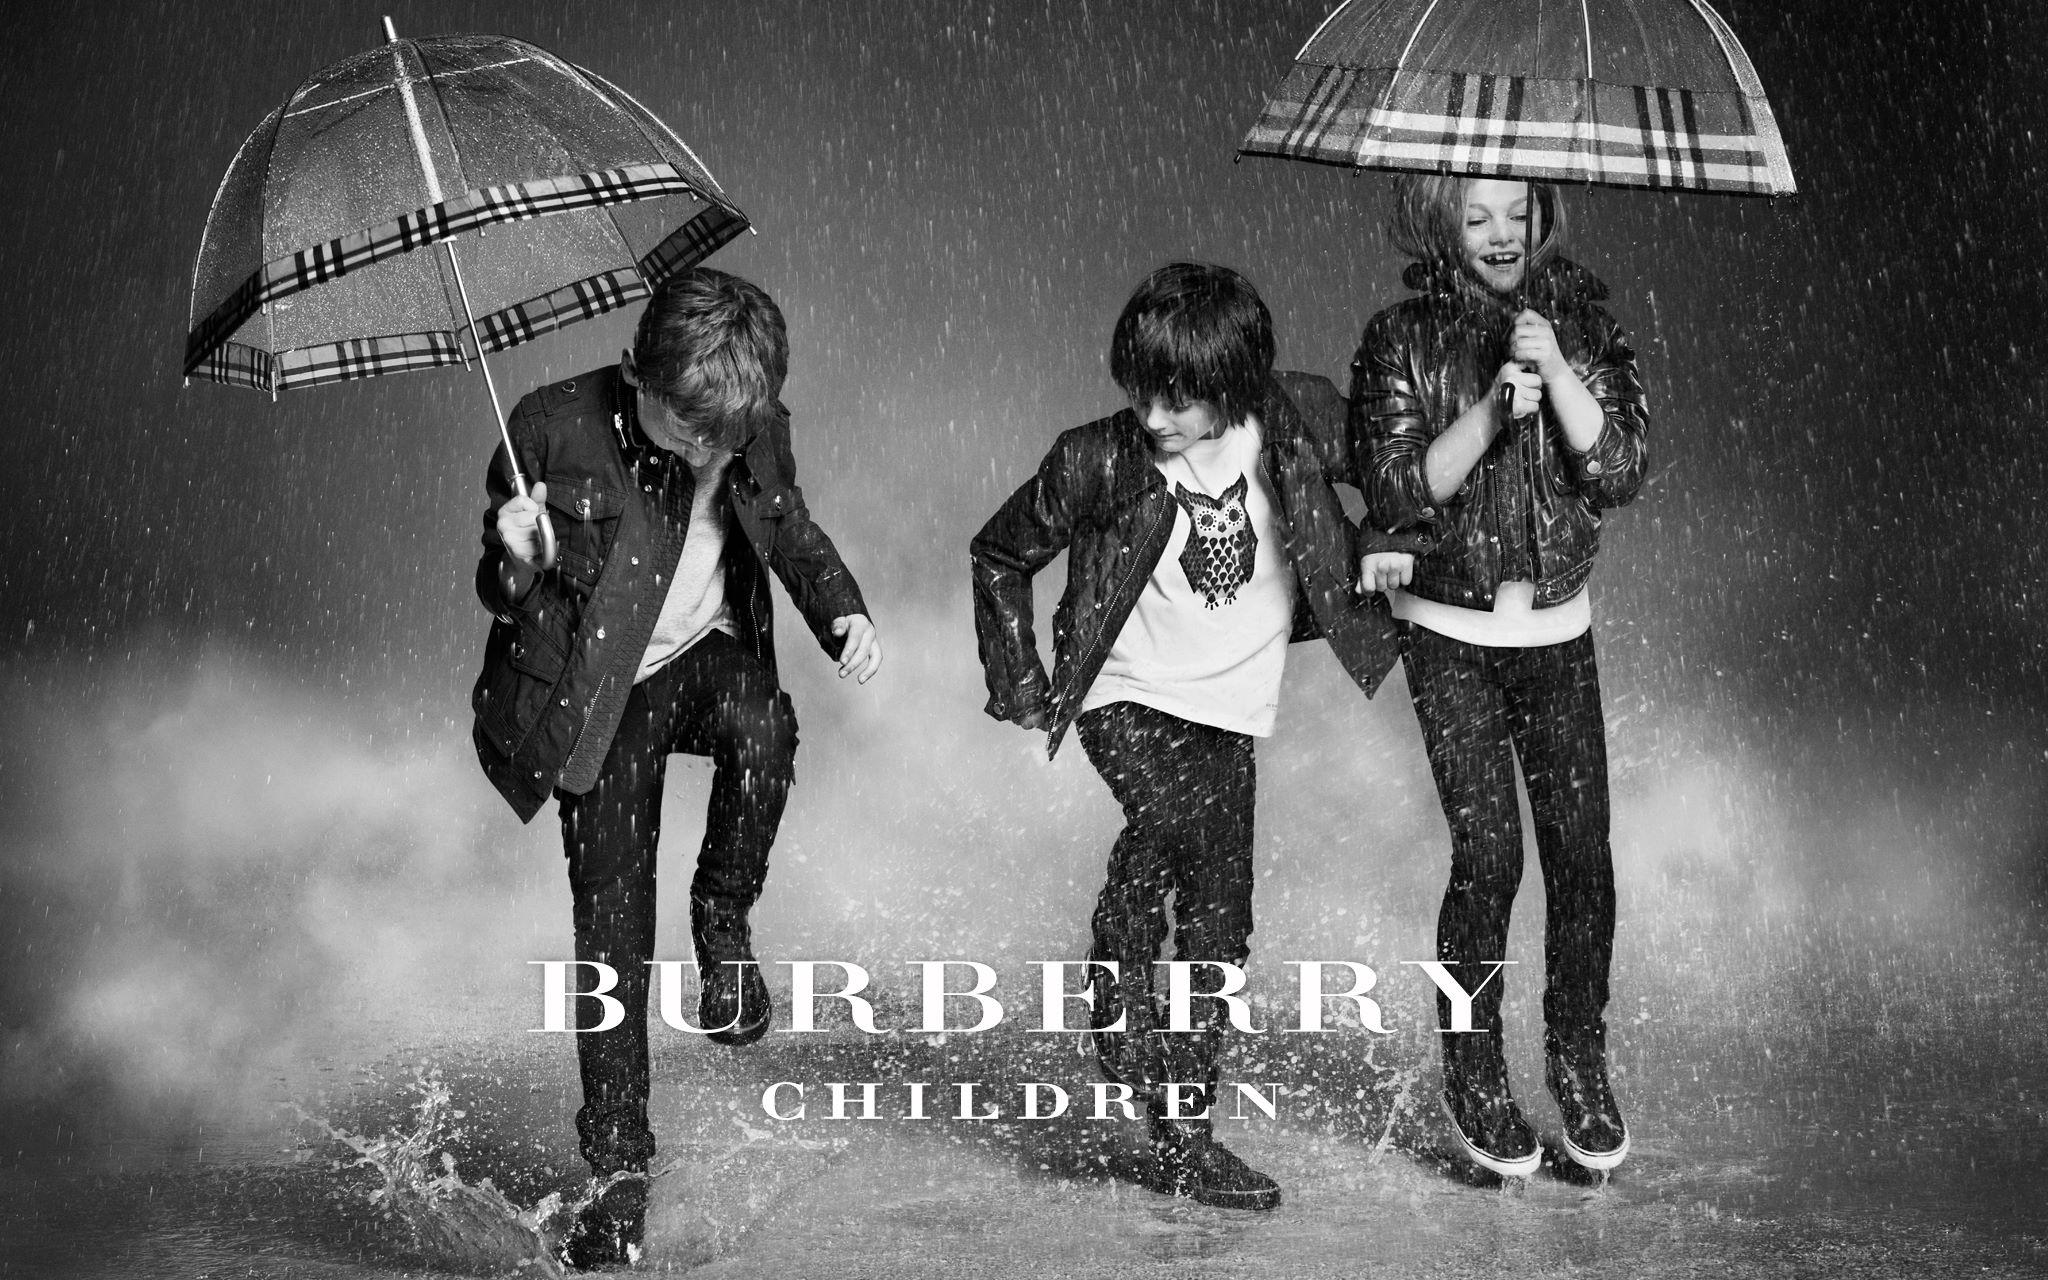 Burberry Childrenswear Fall Winter 2012 campaign